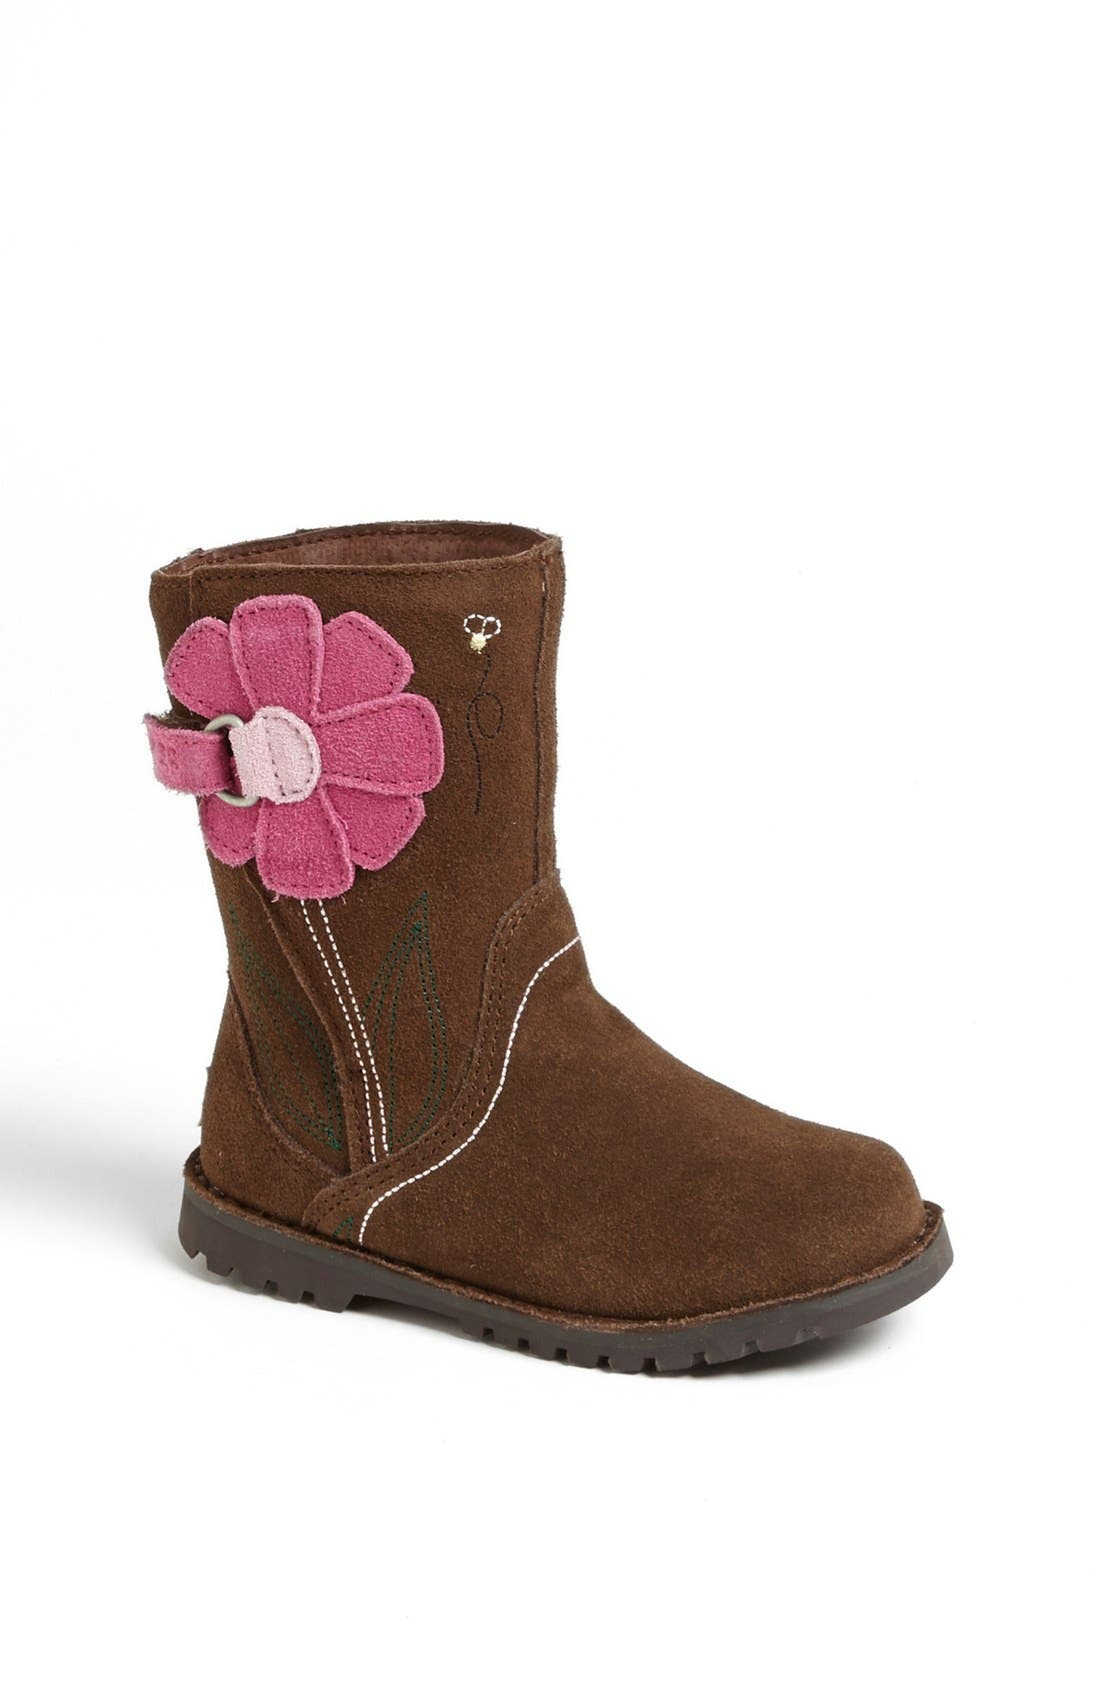 Main Image - UGG® Australia 'Blossom' Boot (Walker & Toddler)